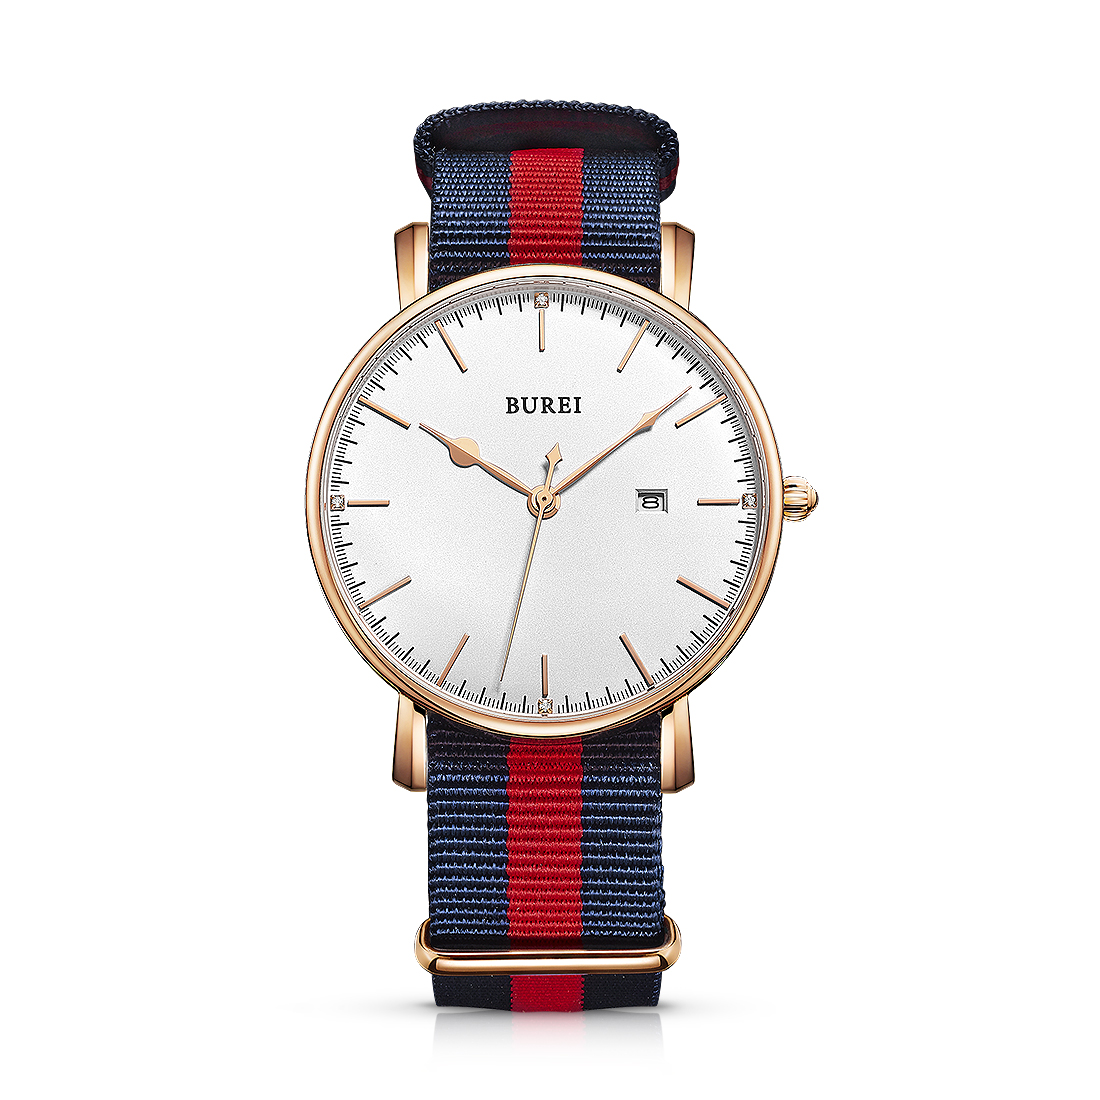 BUREI 13002 Switzerland watches men luxury brand Bauhaus series Milan lovers sapphire rose gold relogio masculino feminino<br><br>Aliexpress